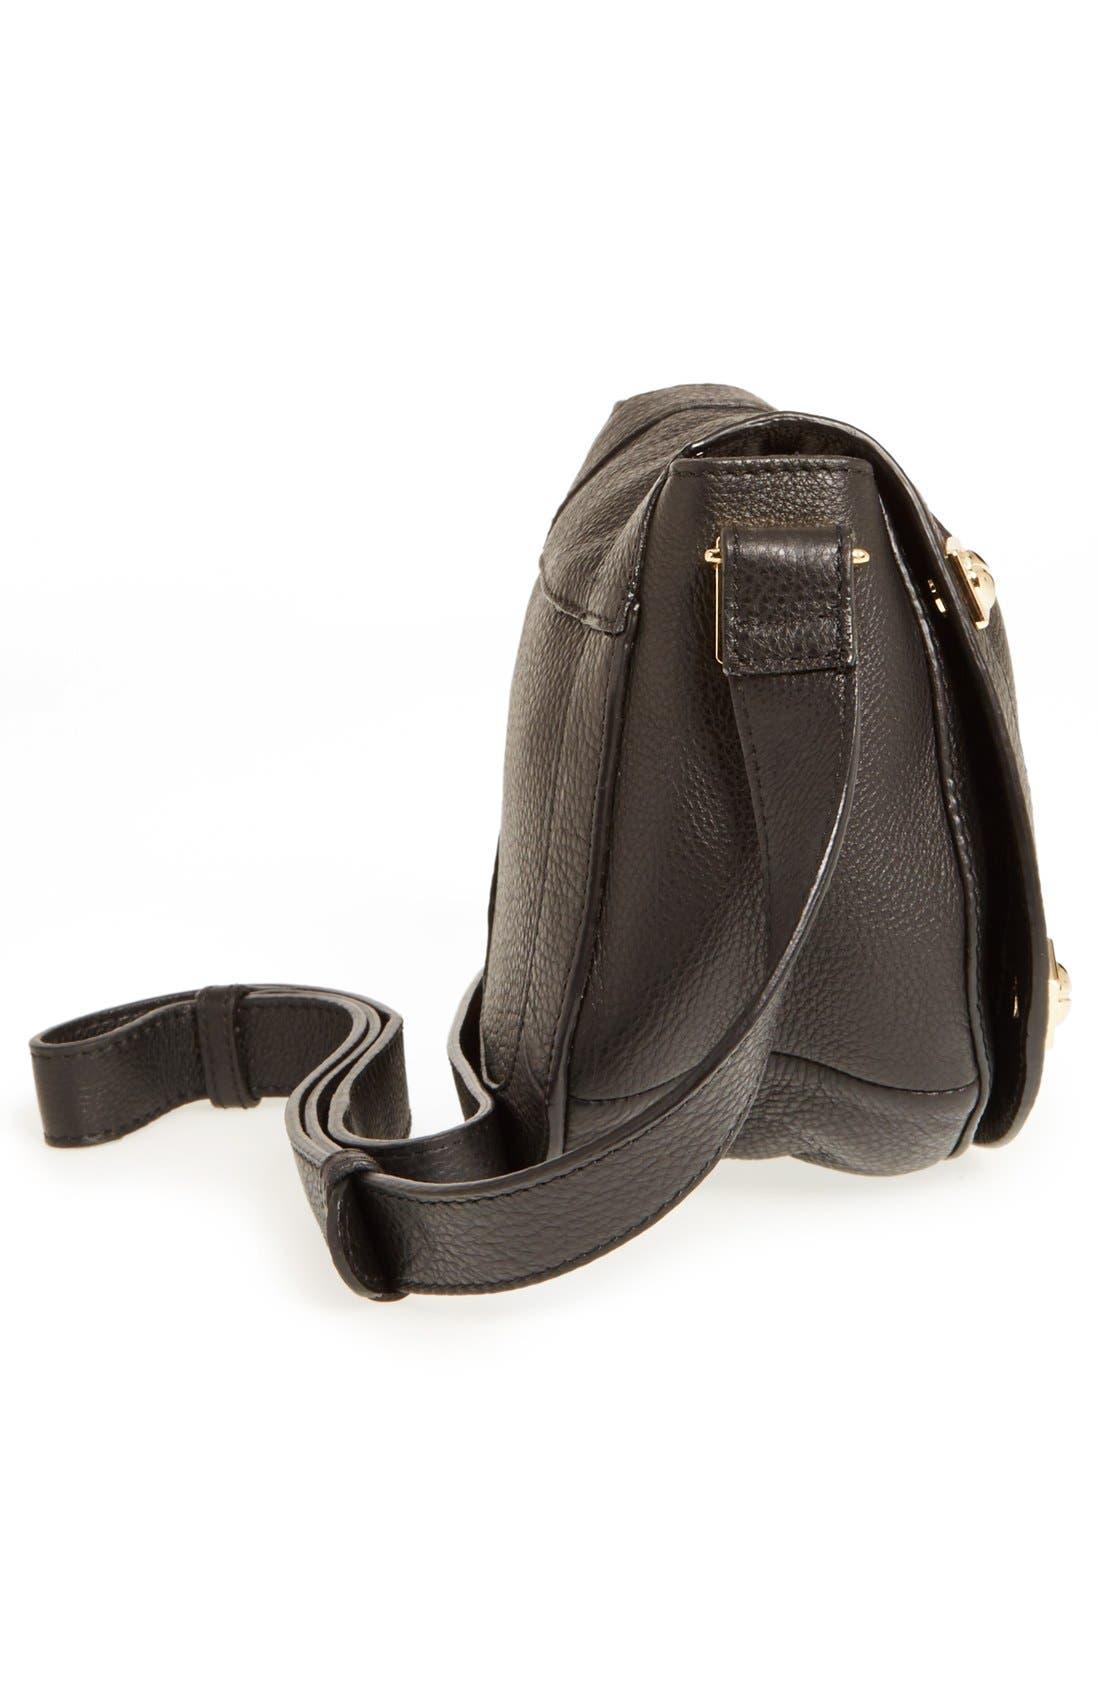 'Mini Sadie' Leather Crossbody Bag,                             Alternate thumbnail 3, color,                             001